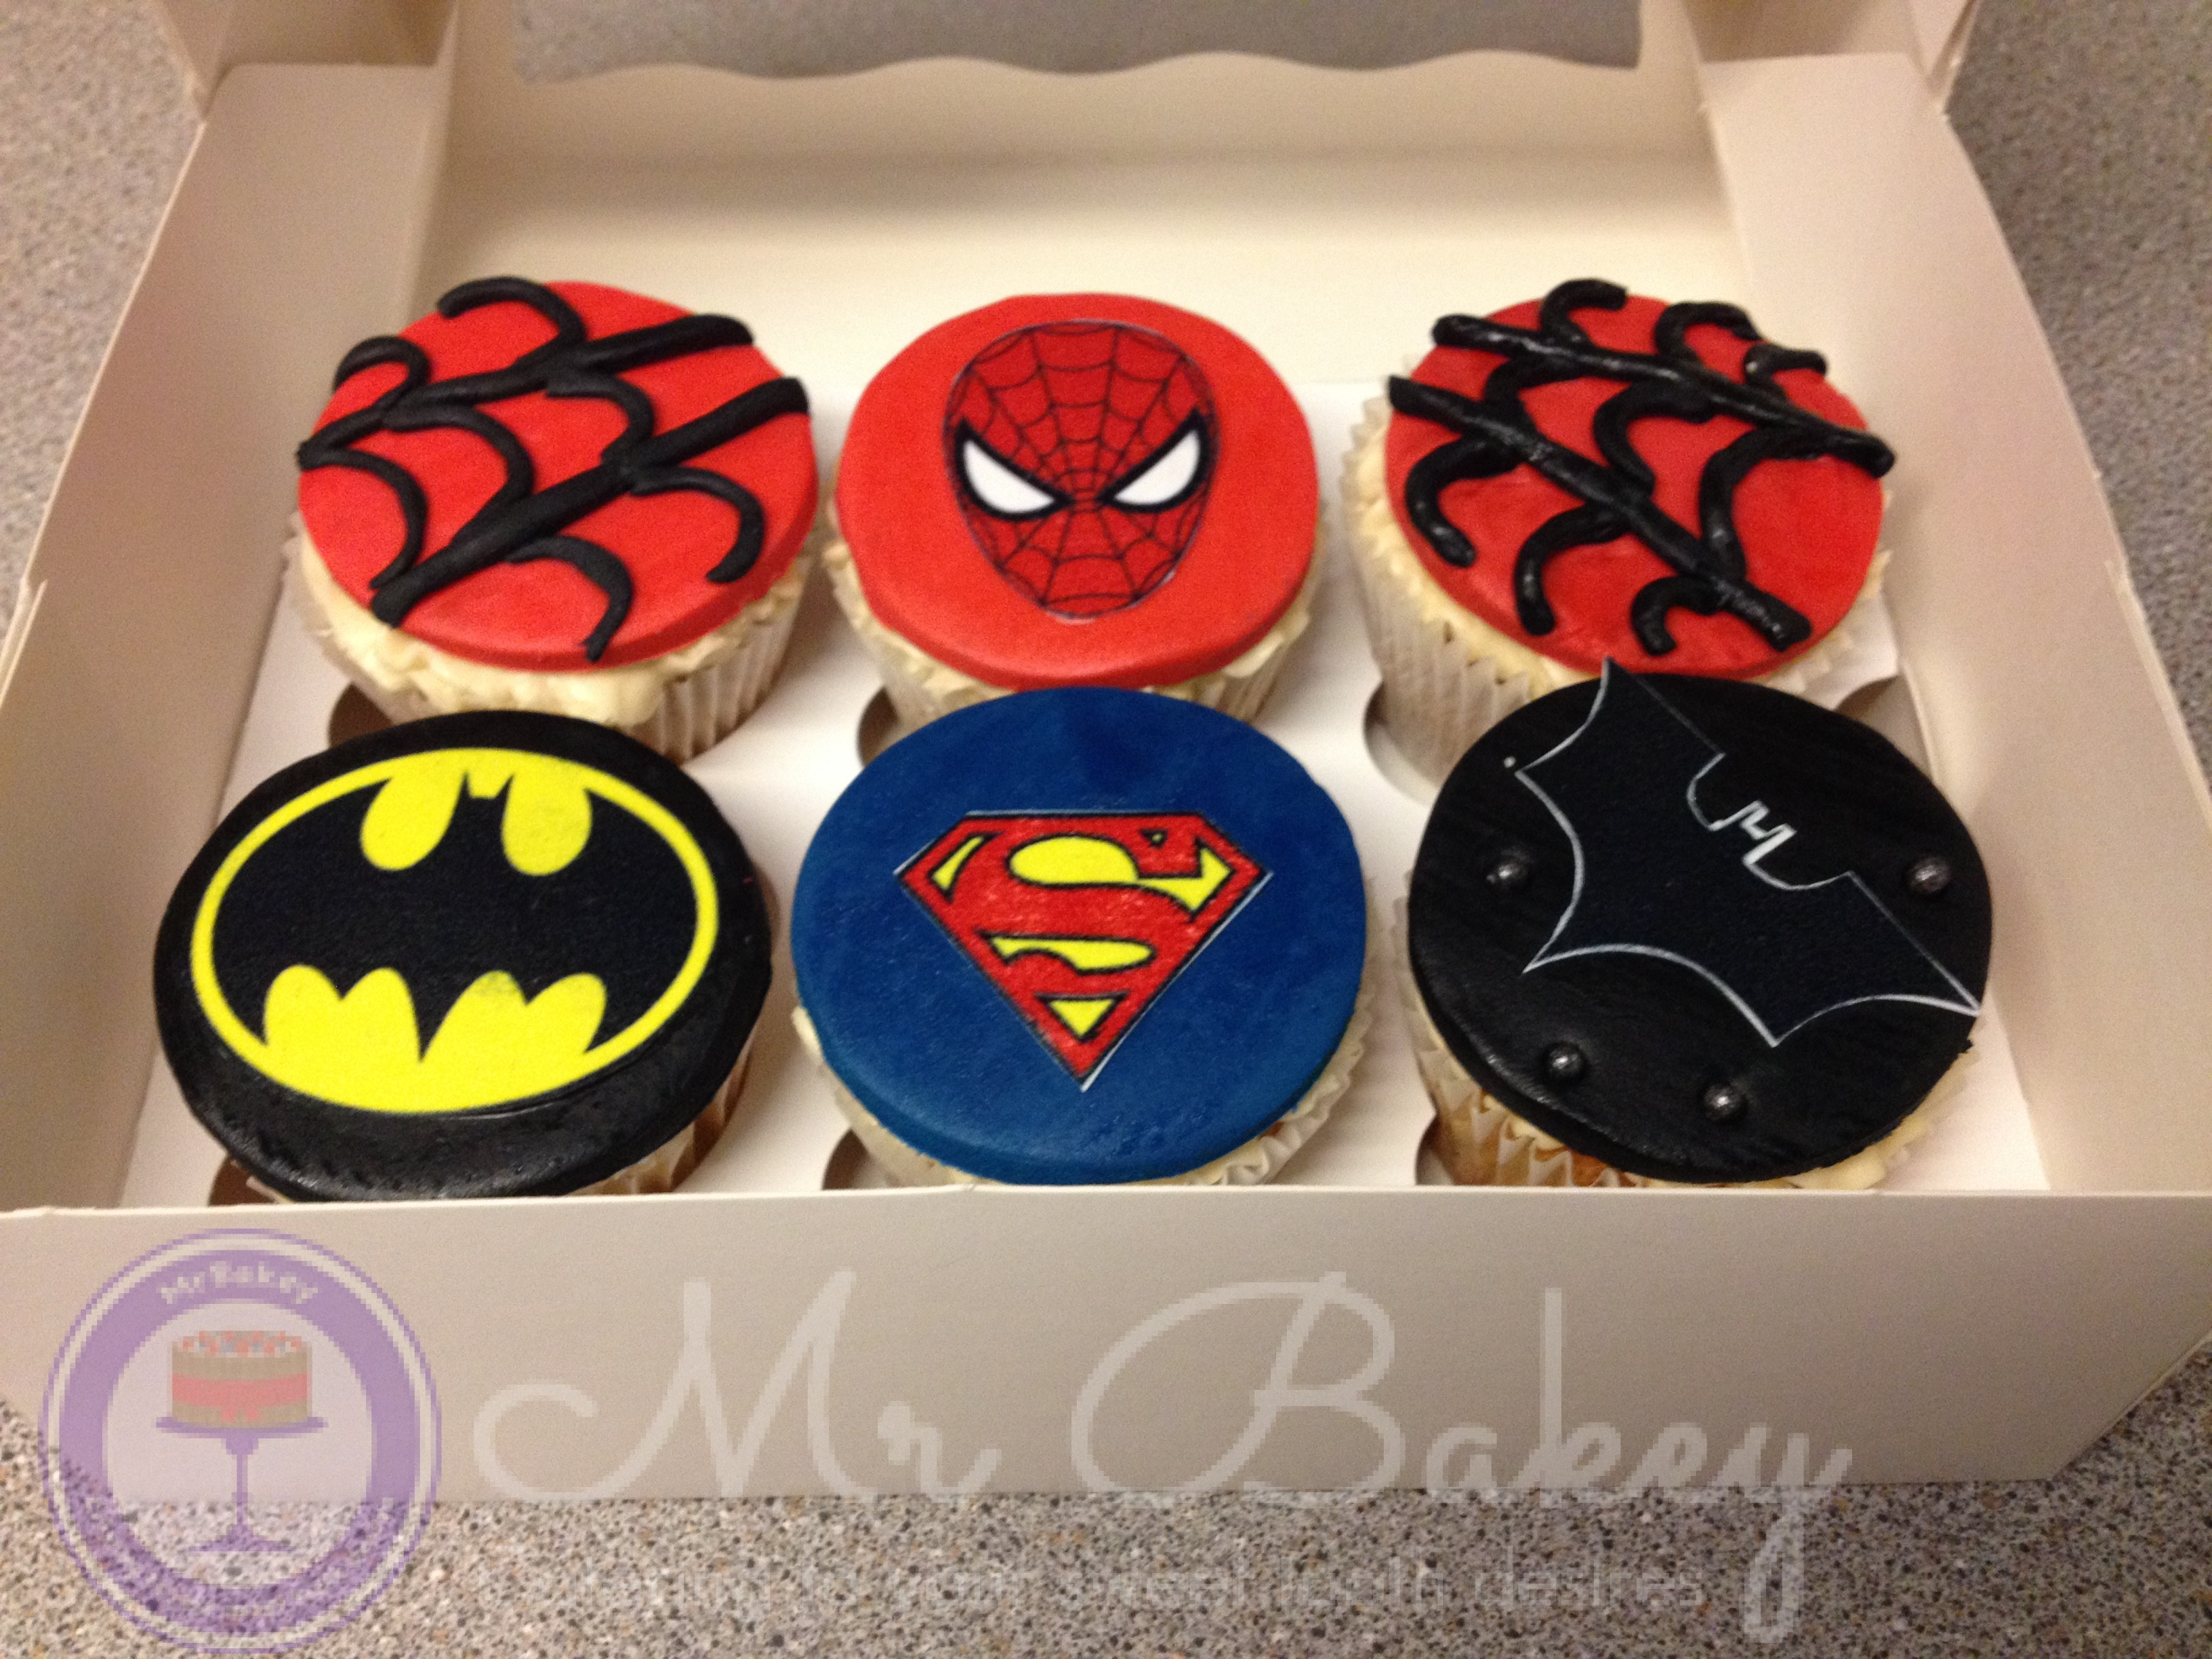 Marvel DC Comic Cupcakes